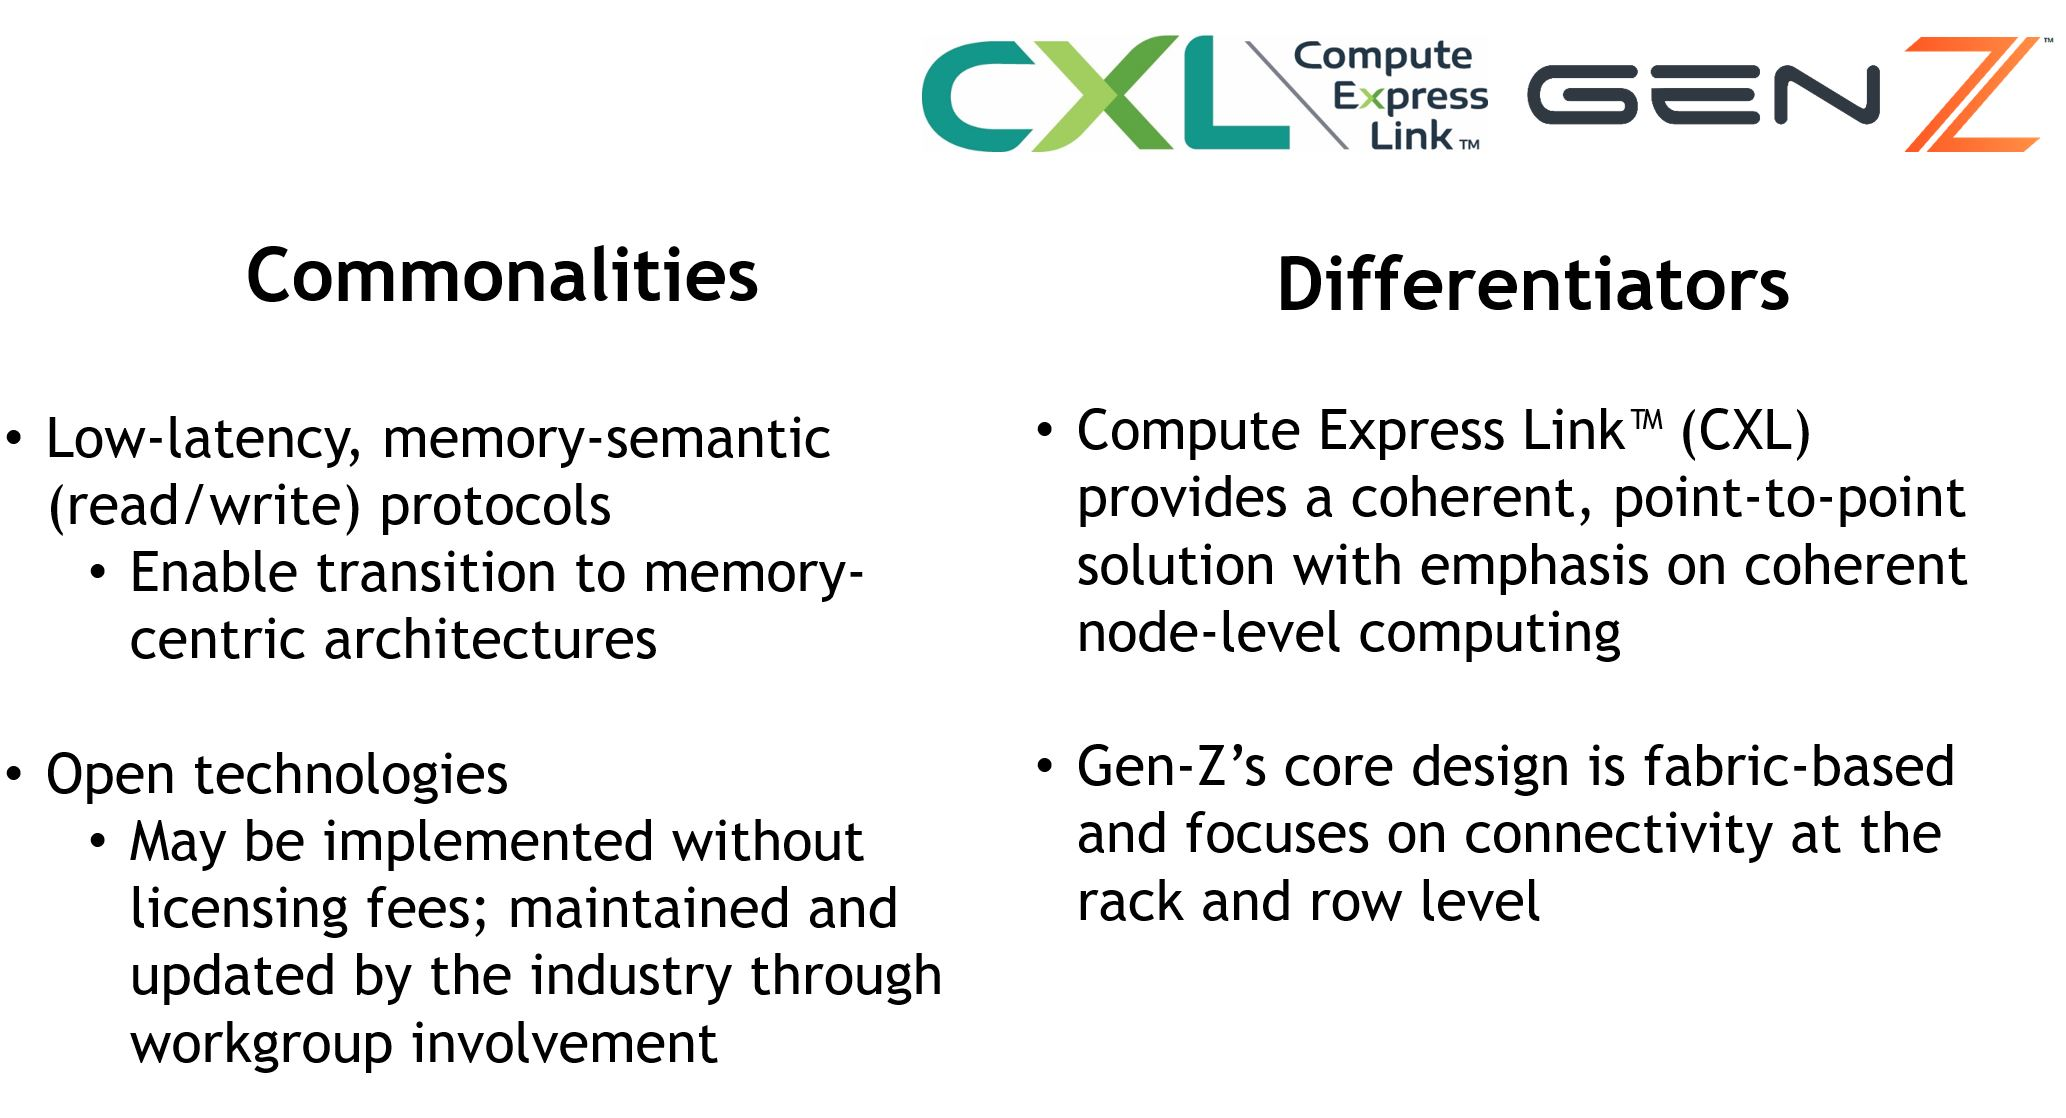 CXL And Gen Z MOU About Gen Z